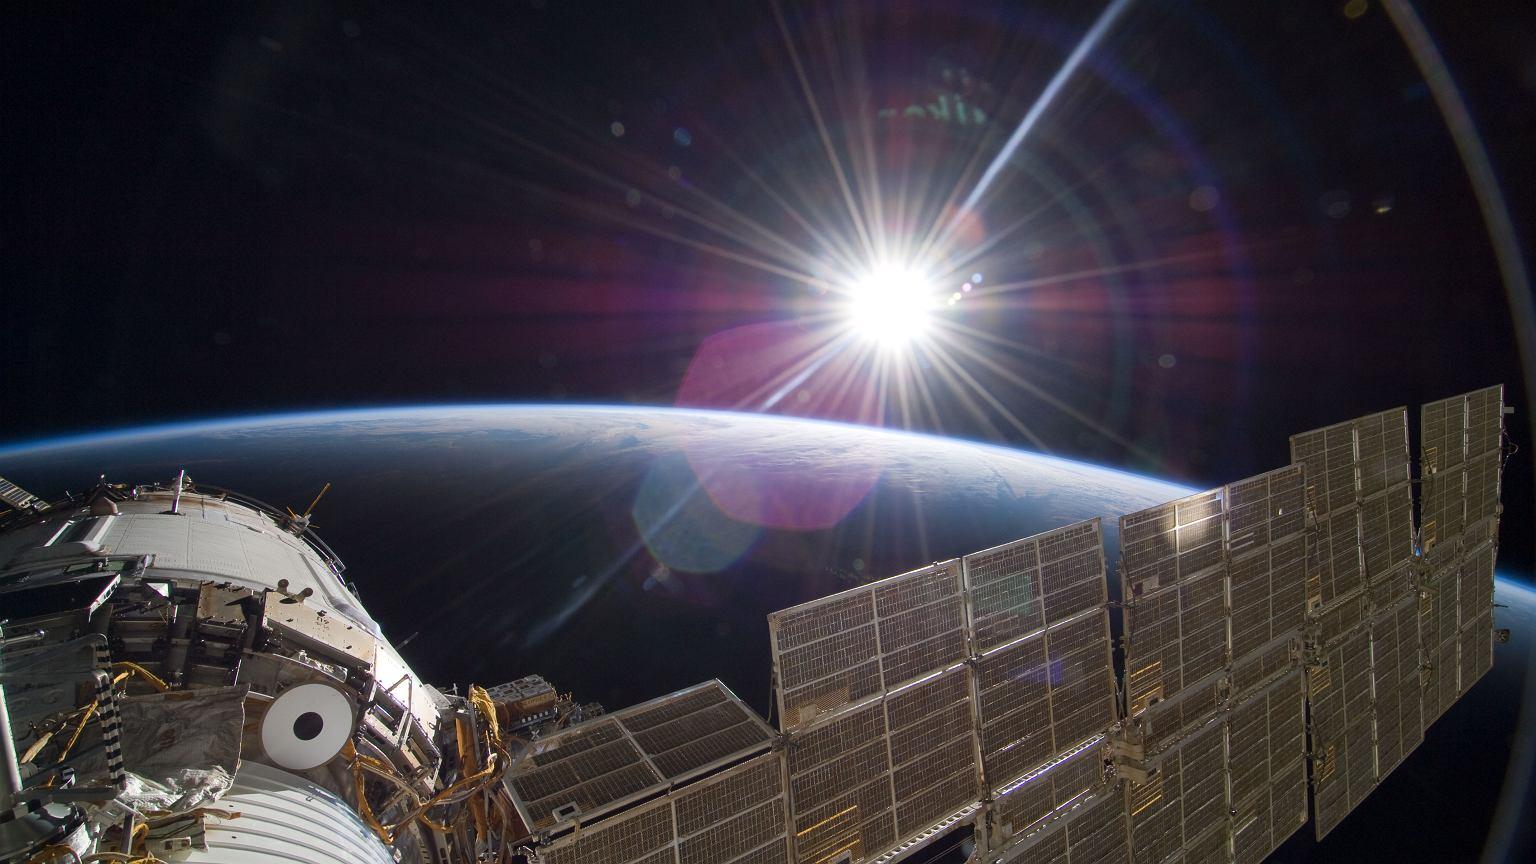 Spacecraft Spacecraft on the Moon - visualization